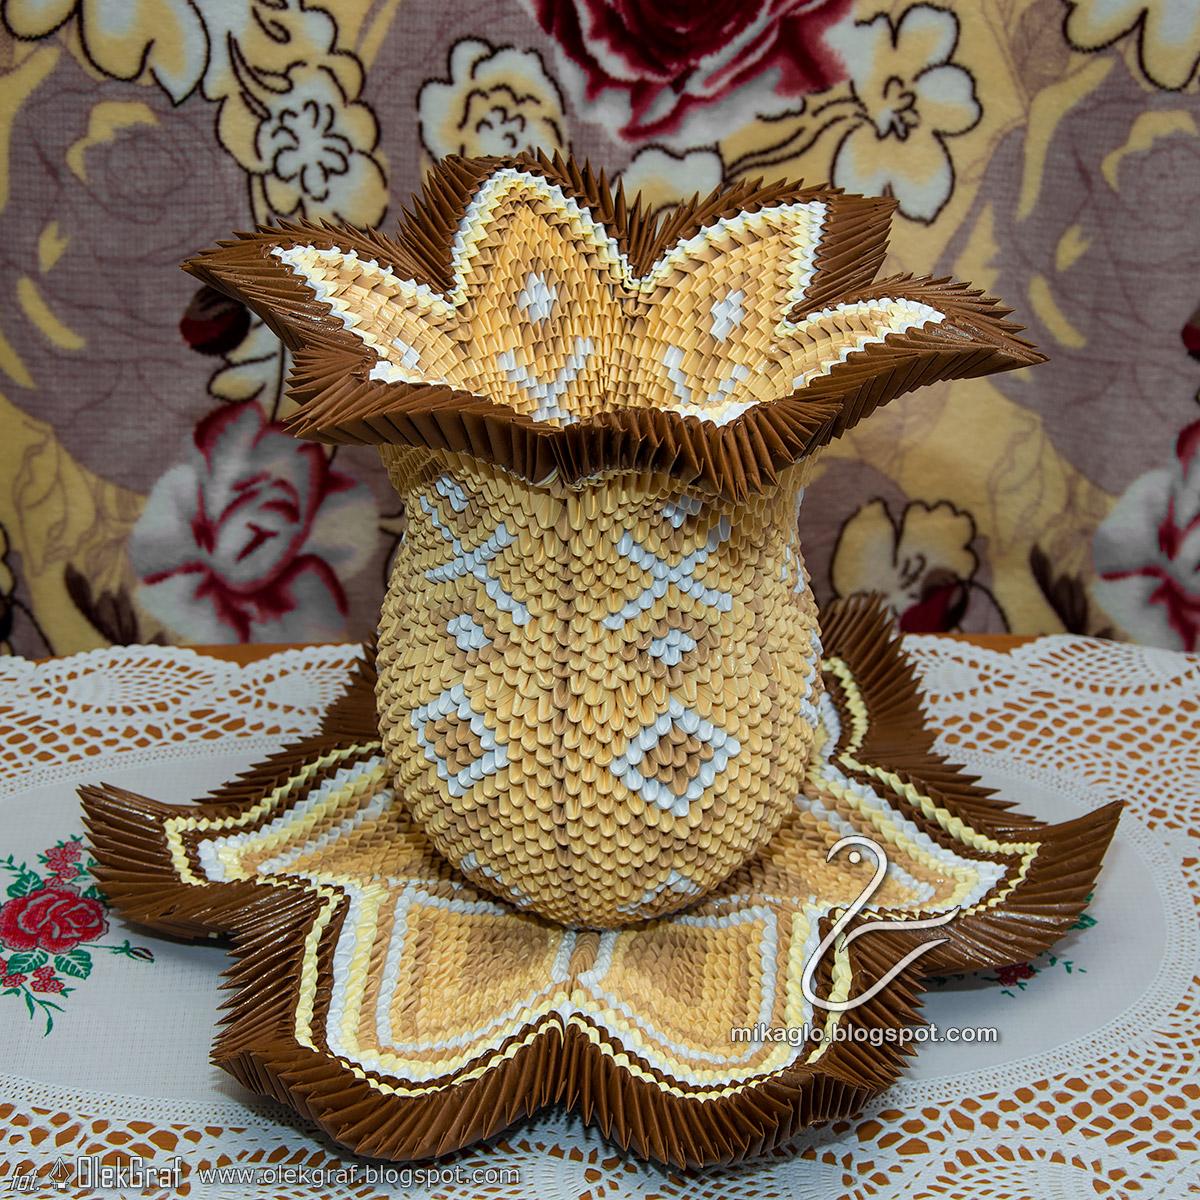 Vase 3d Origami Diagram: Mikaglo: 315. Waza Lotos Z Origami / 3d